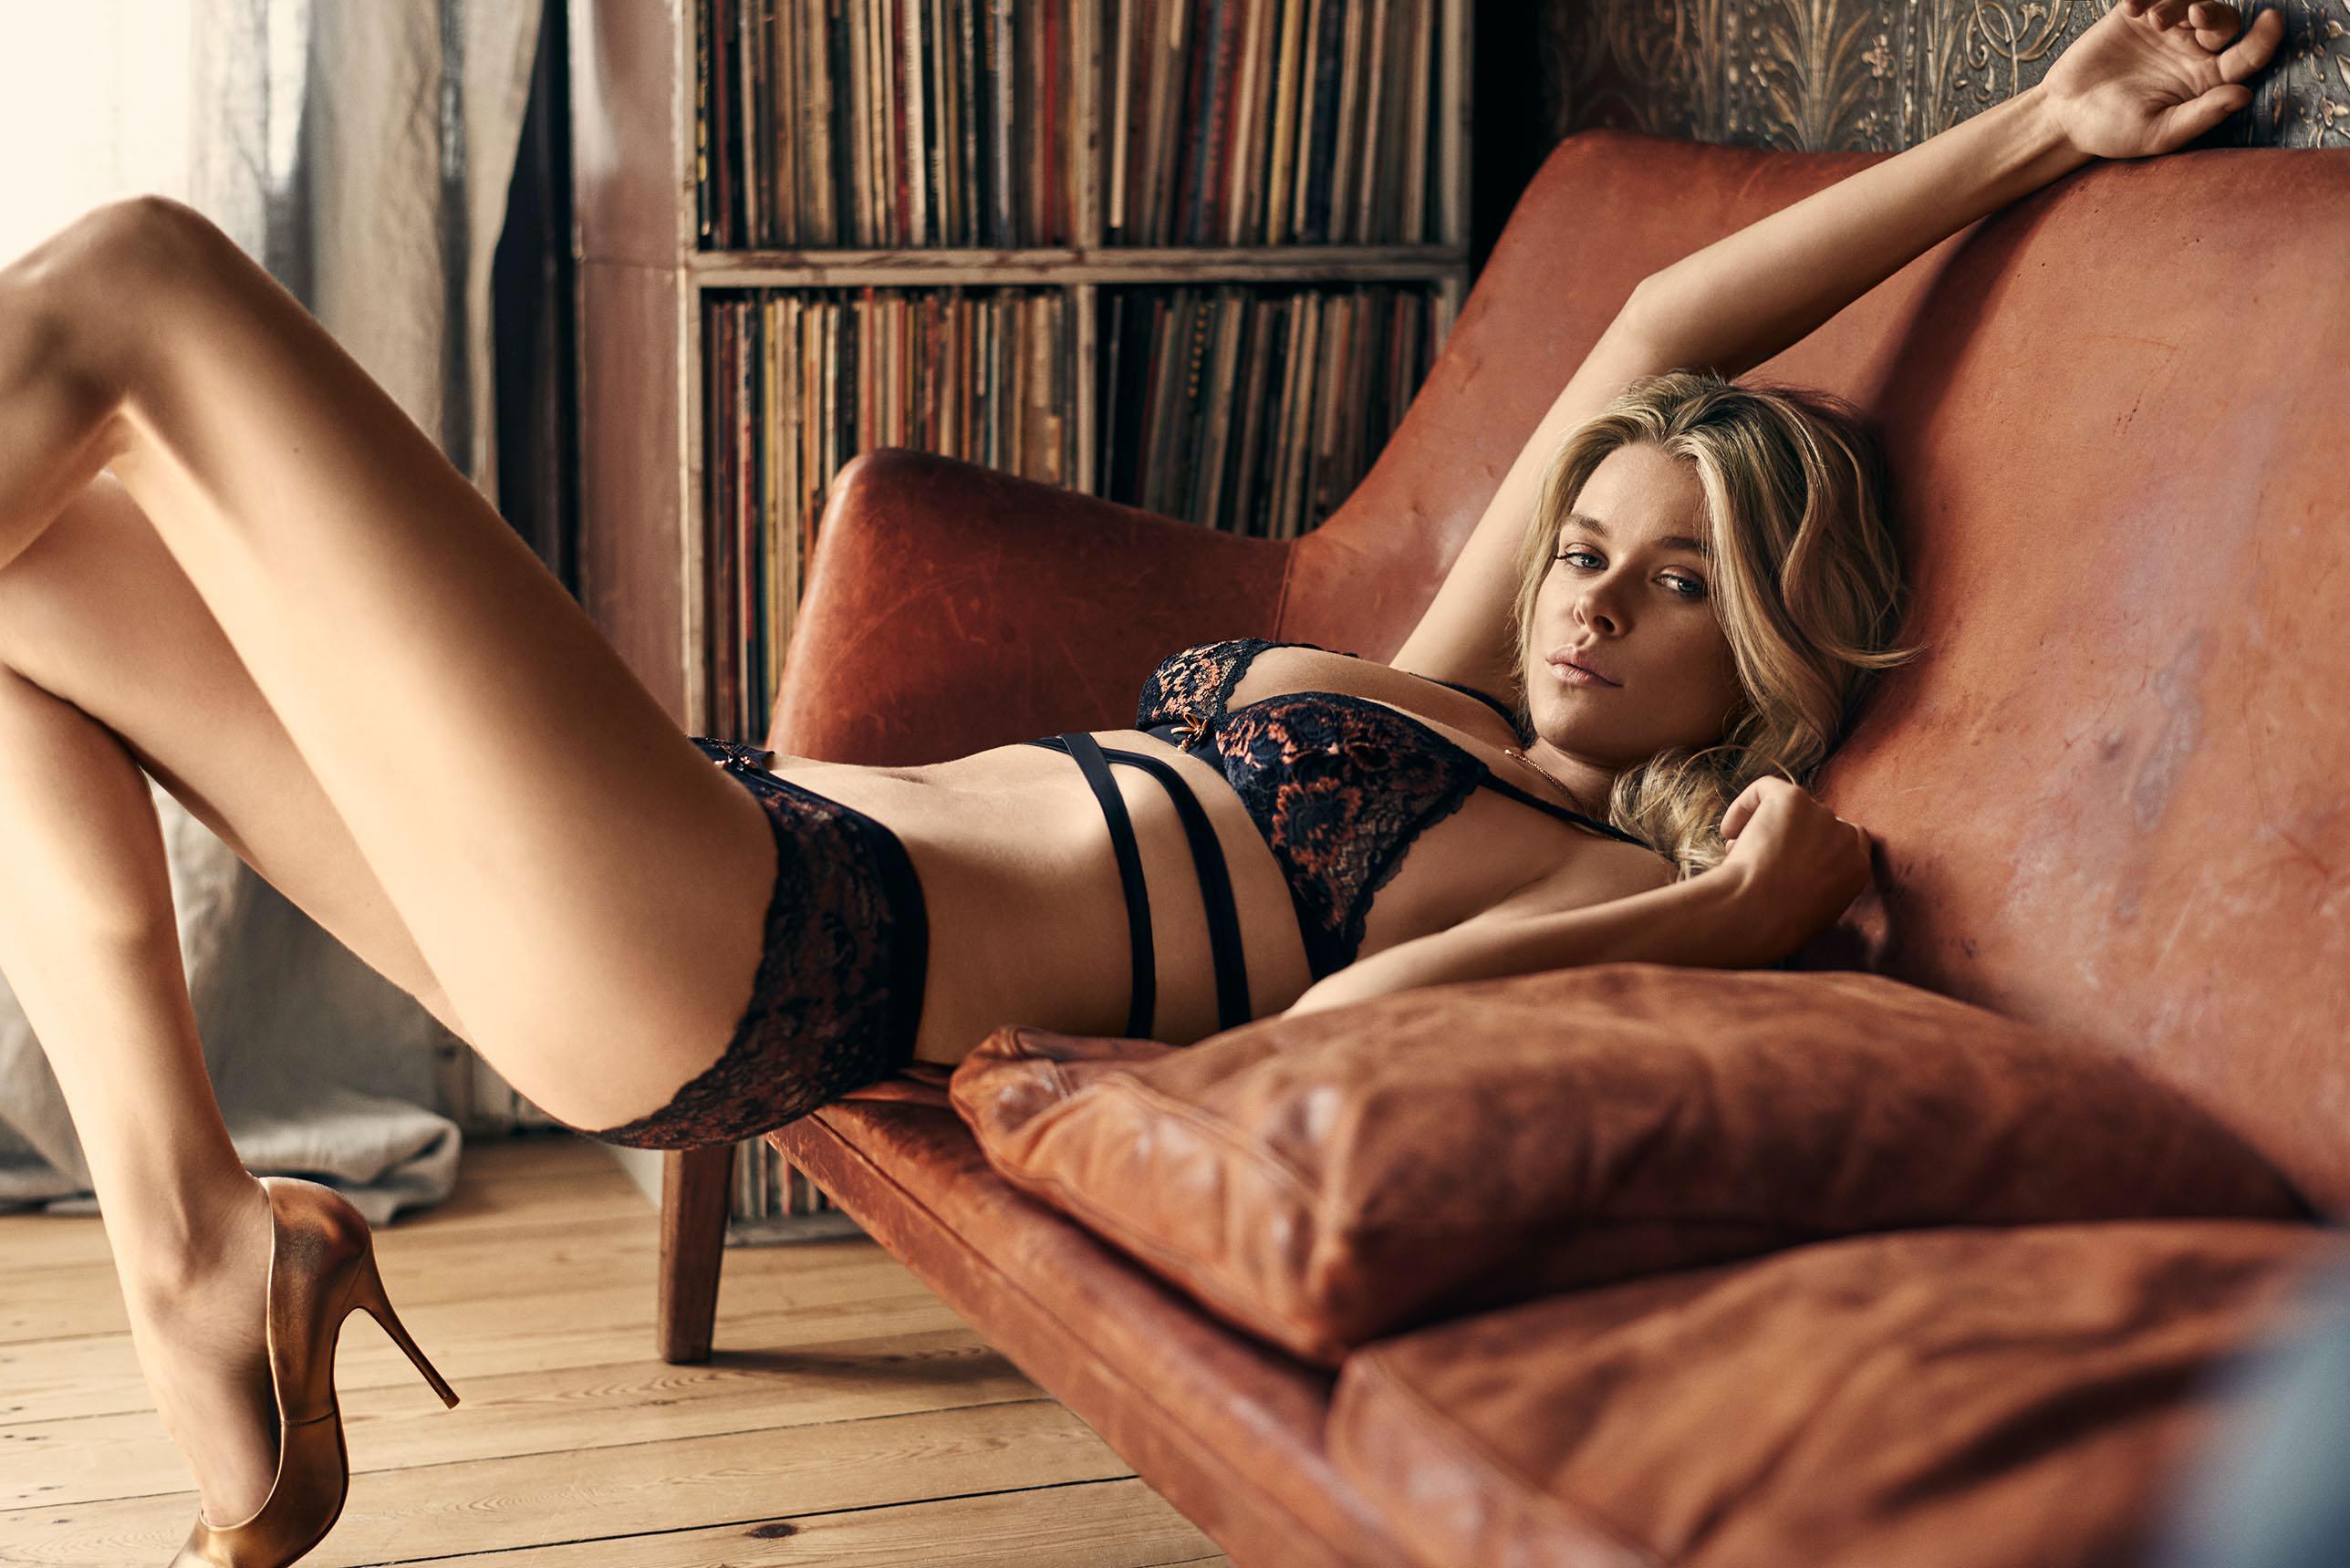 XXX Angellica Bell nude photos 2019